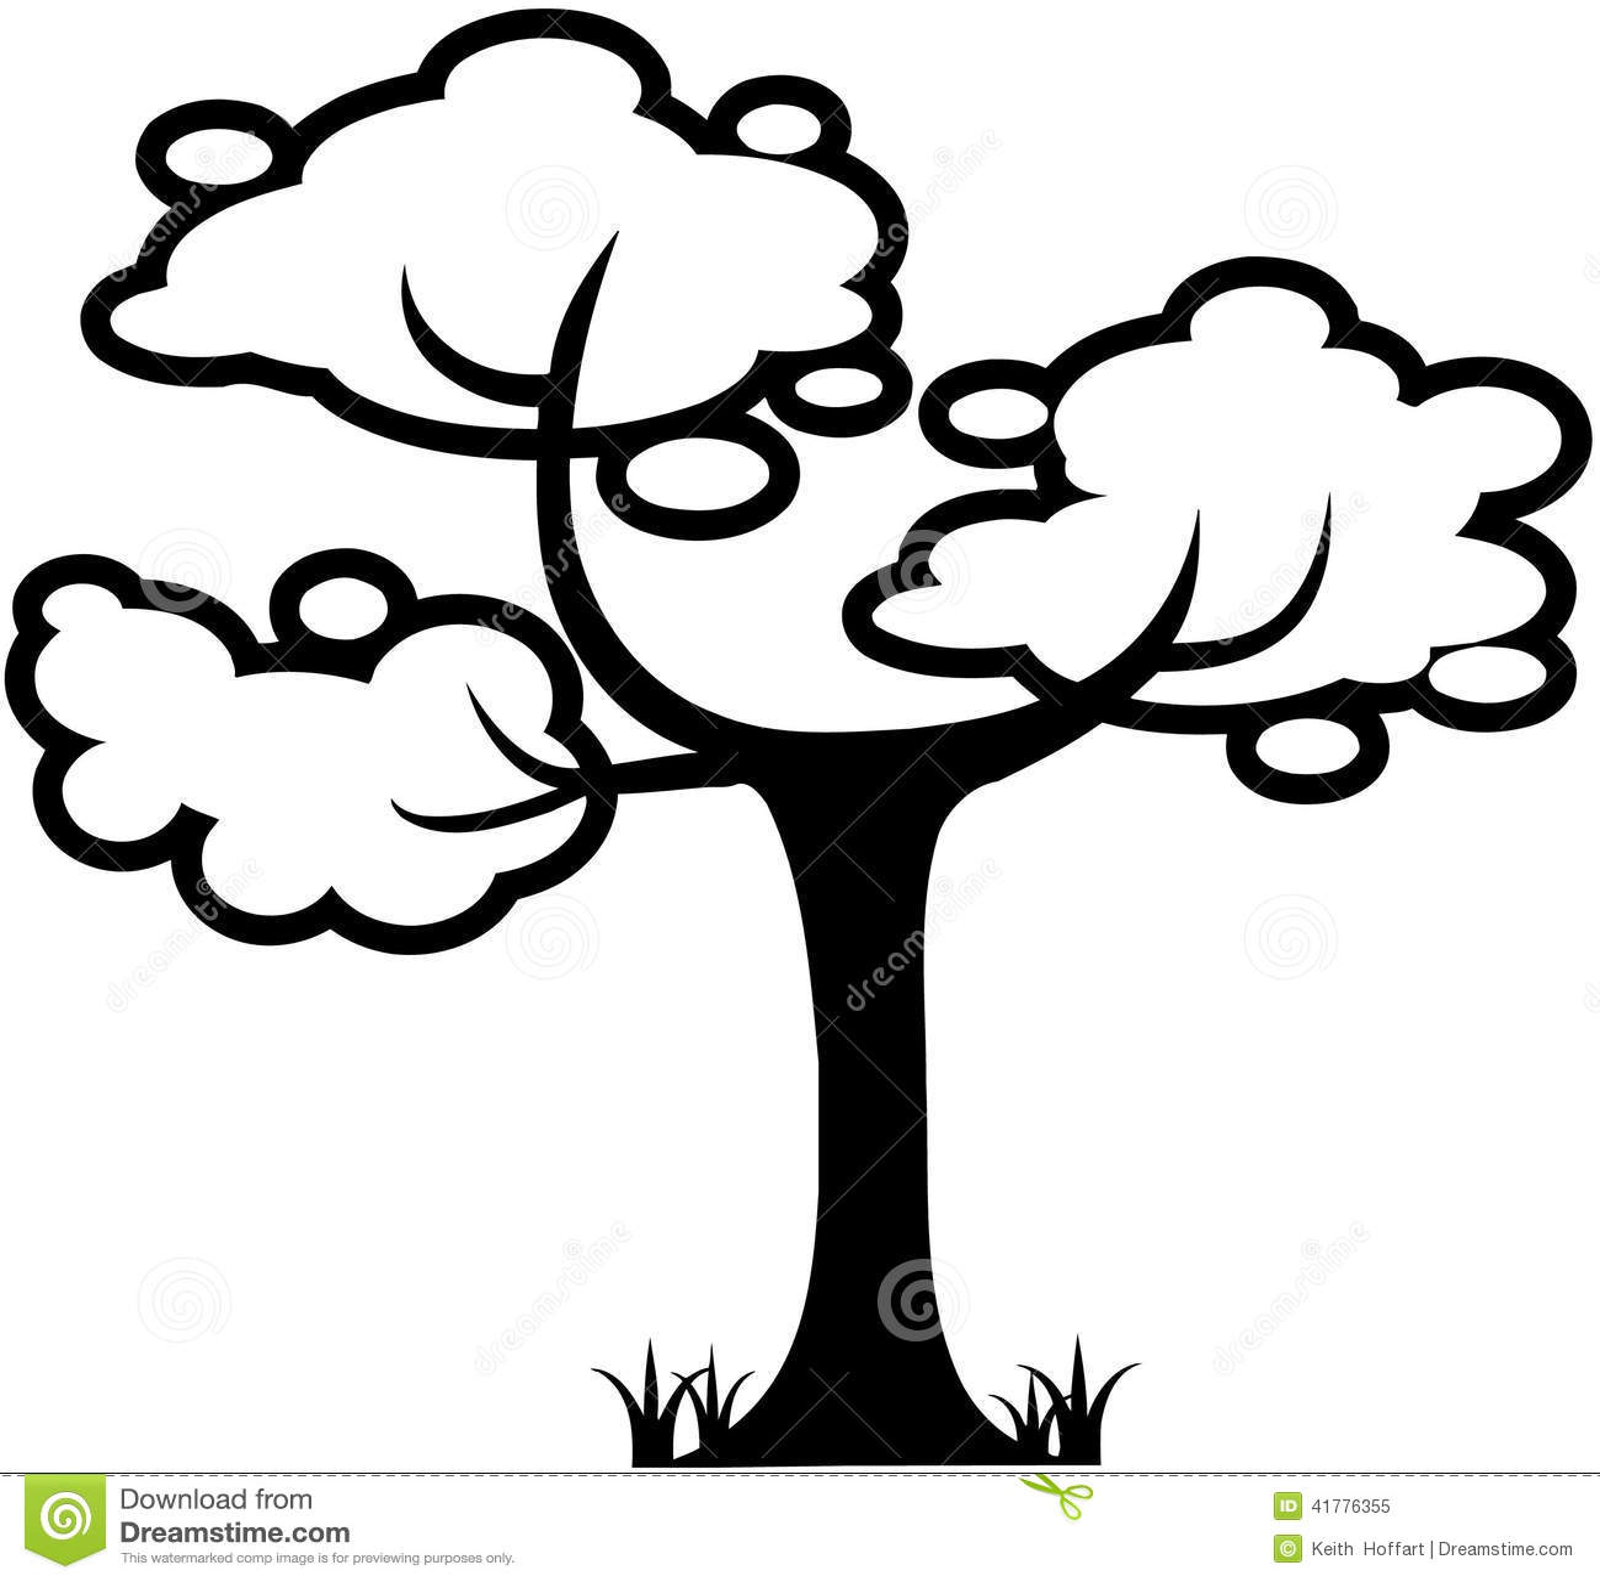 Cartoon Tree Bark Stock Illustrations 2 522 Cartoon Tree Bark Stock Illustrations Vectors Clipart Dreamstime Cartoon tree branches and green leaves. dreamstime com